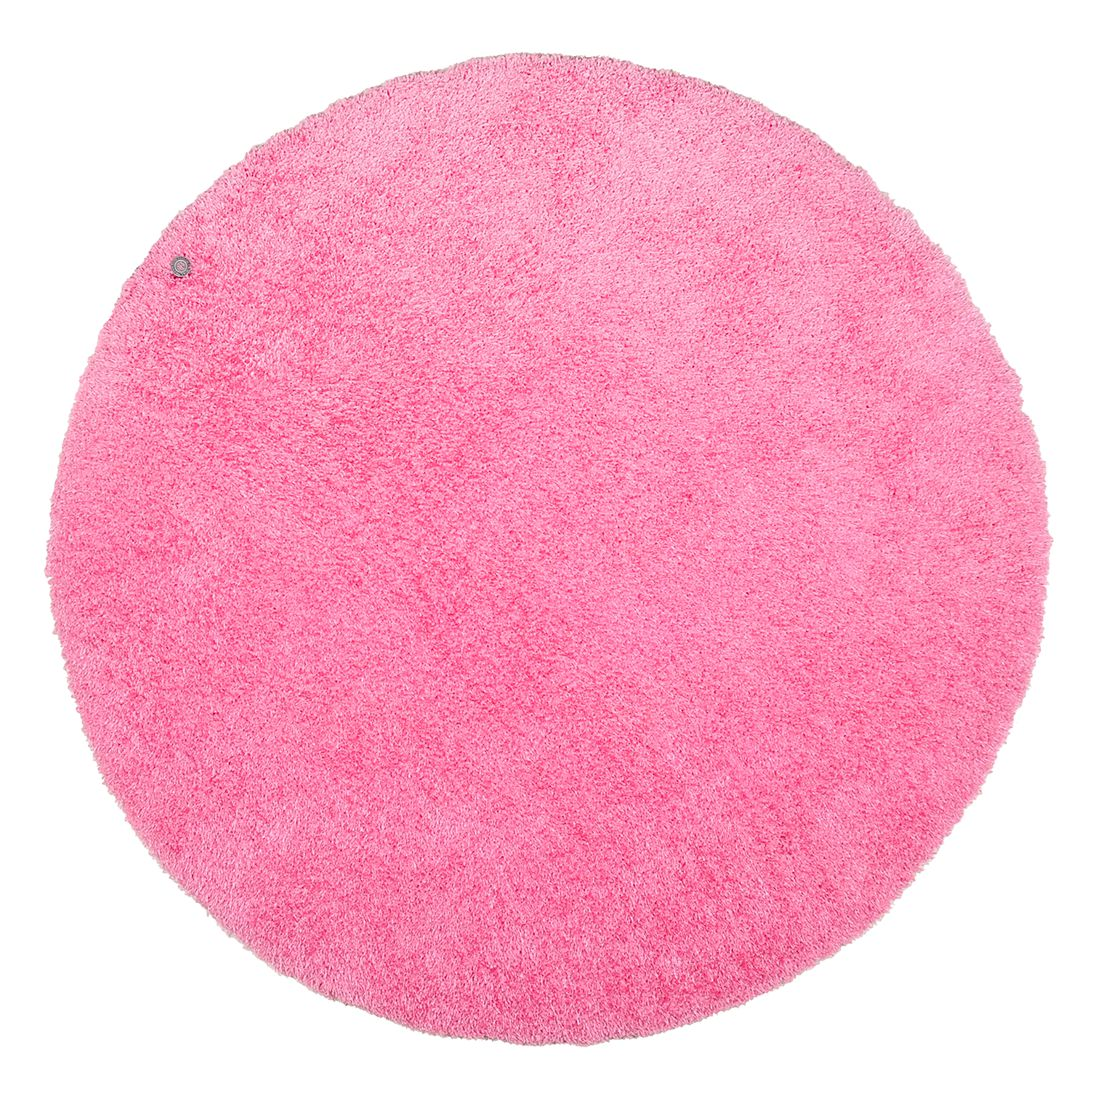 Image of Tappeto soft round - rosa - dimensioni: 140 x 140 cm, Tom Tailor